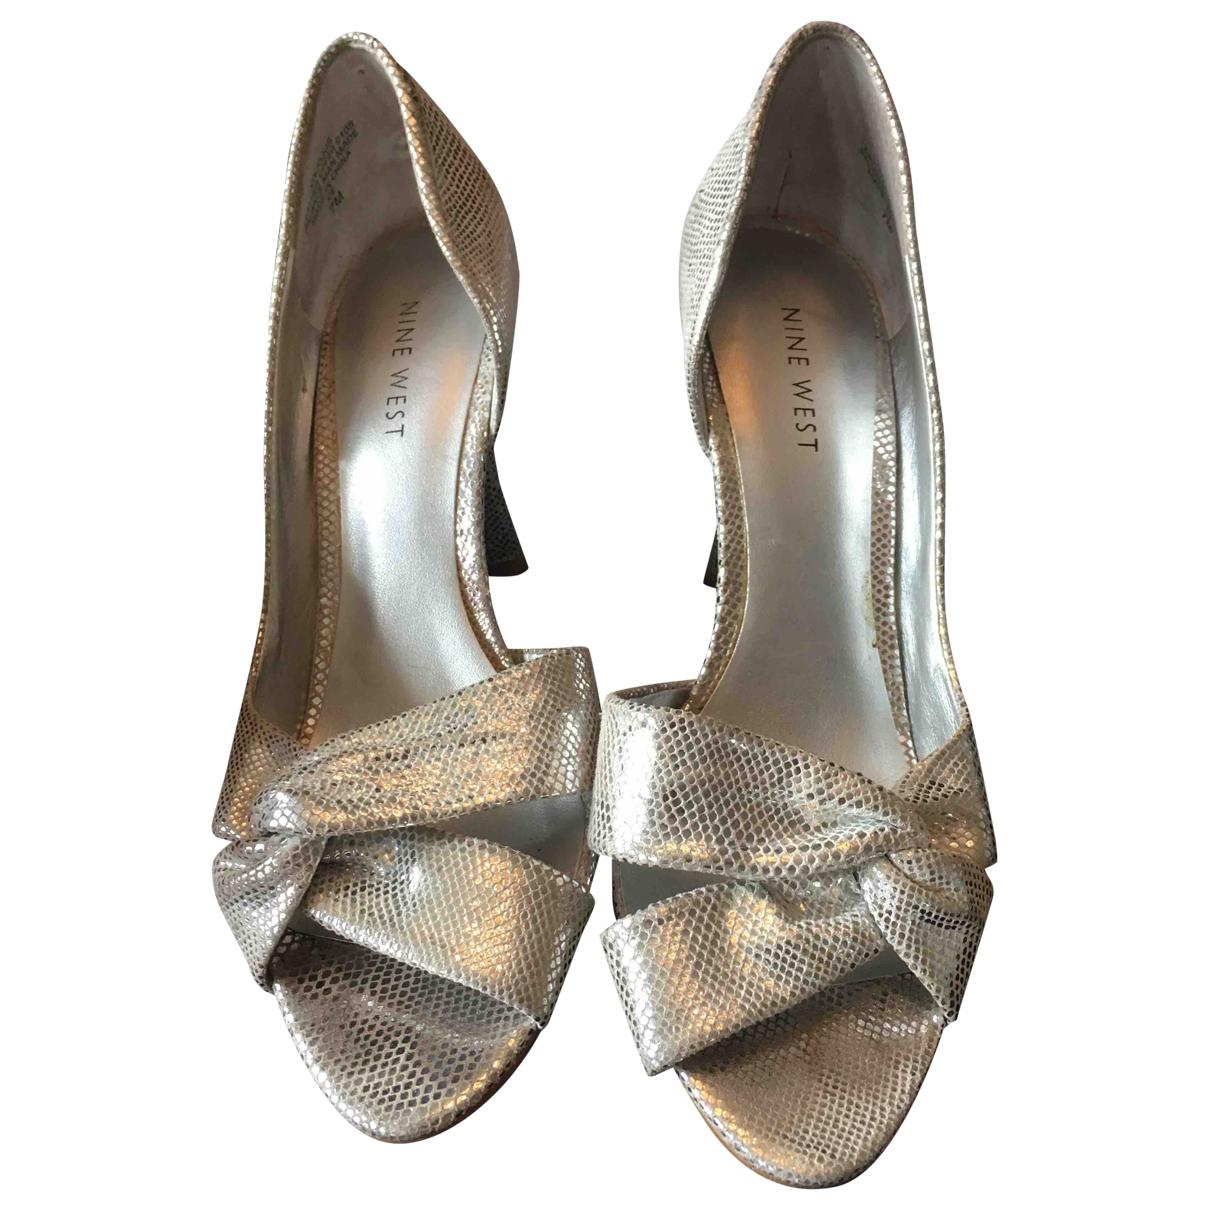 Nine West \N Metallic Leather Heels for Women 38 EU